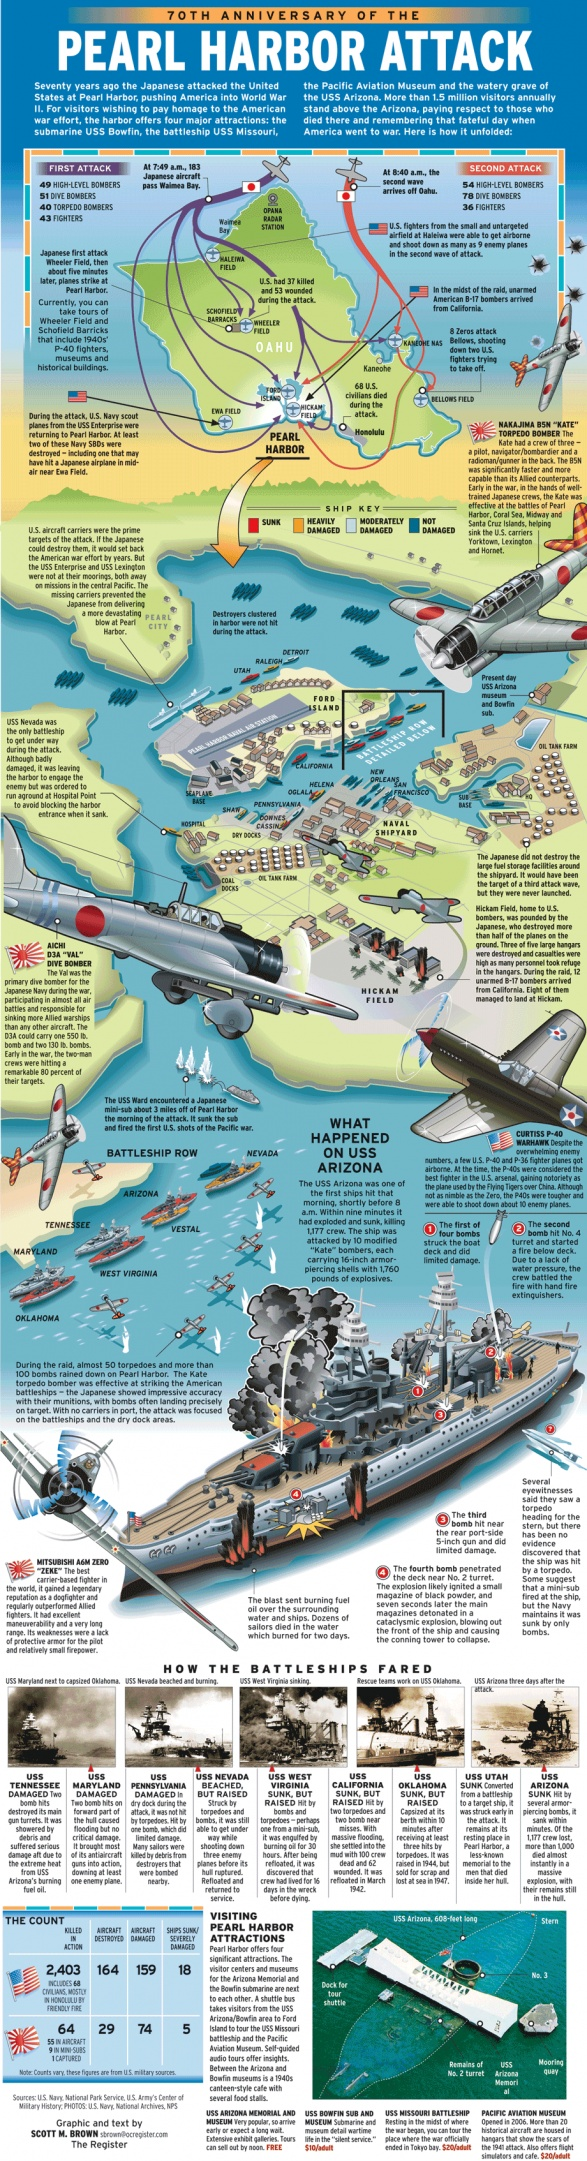 Pearl Harbor Attack #WW2 #Worldwar